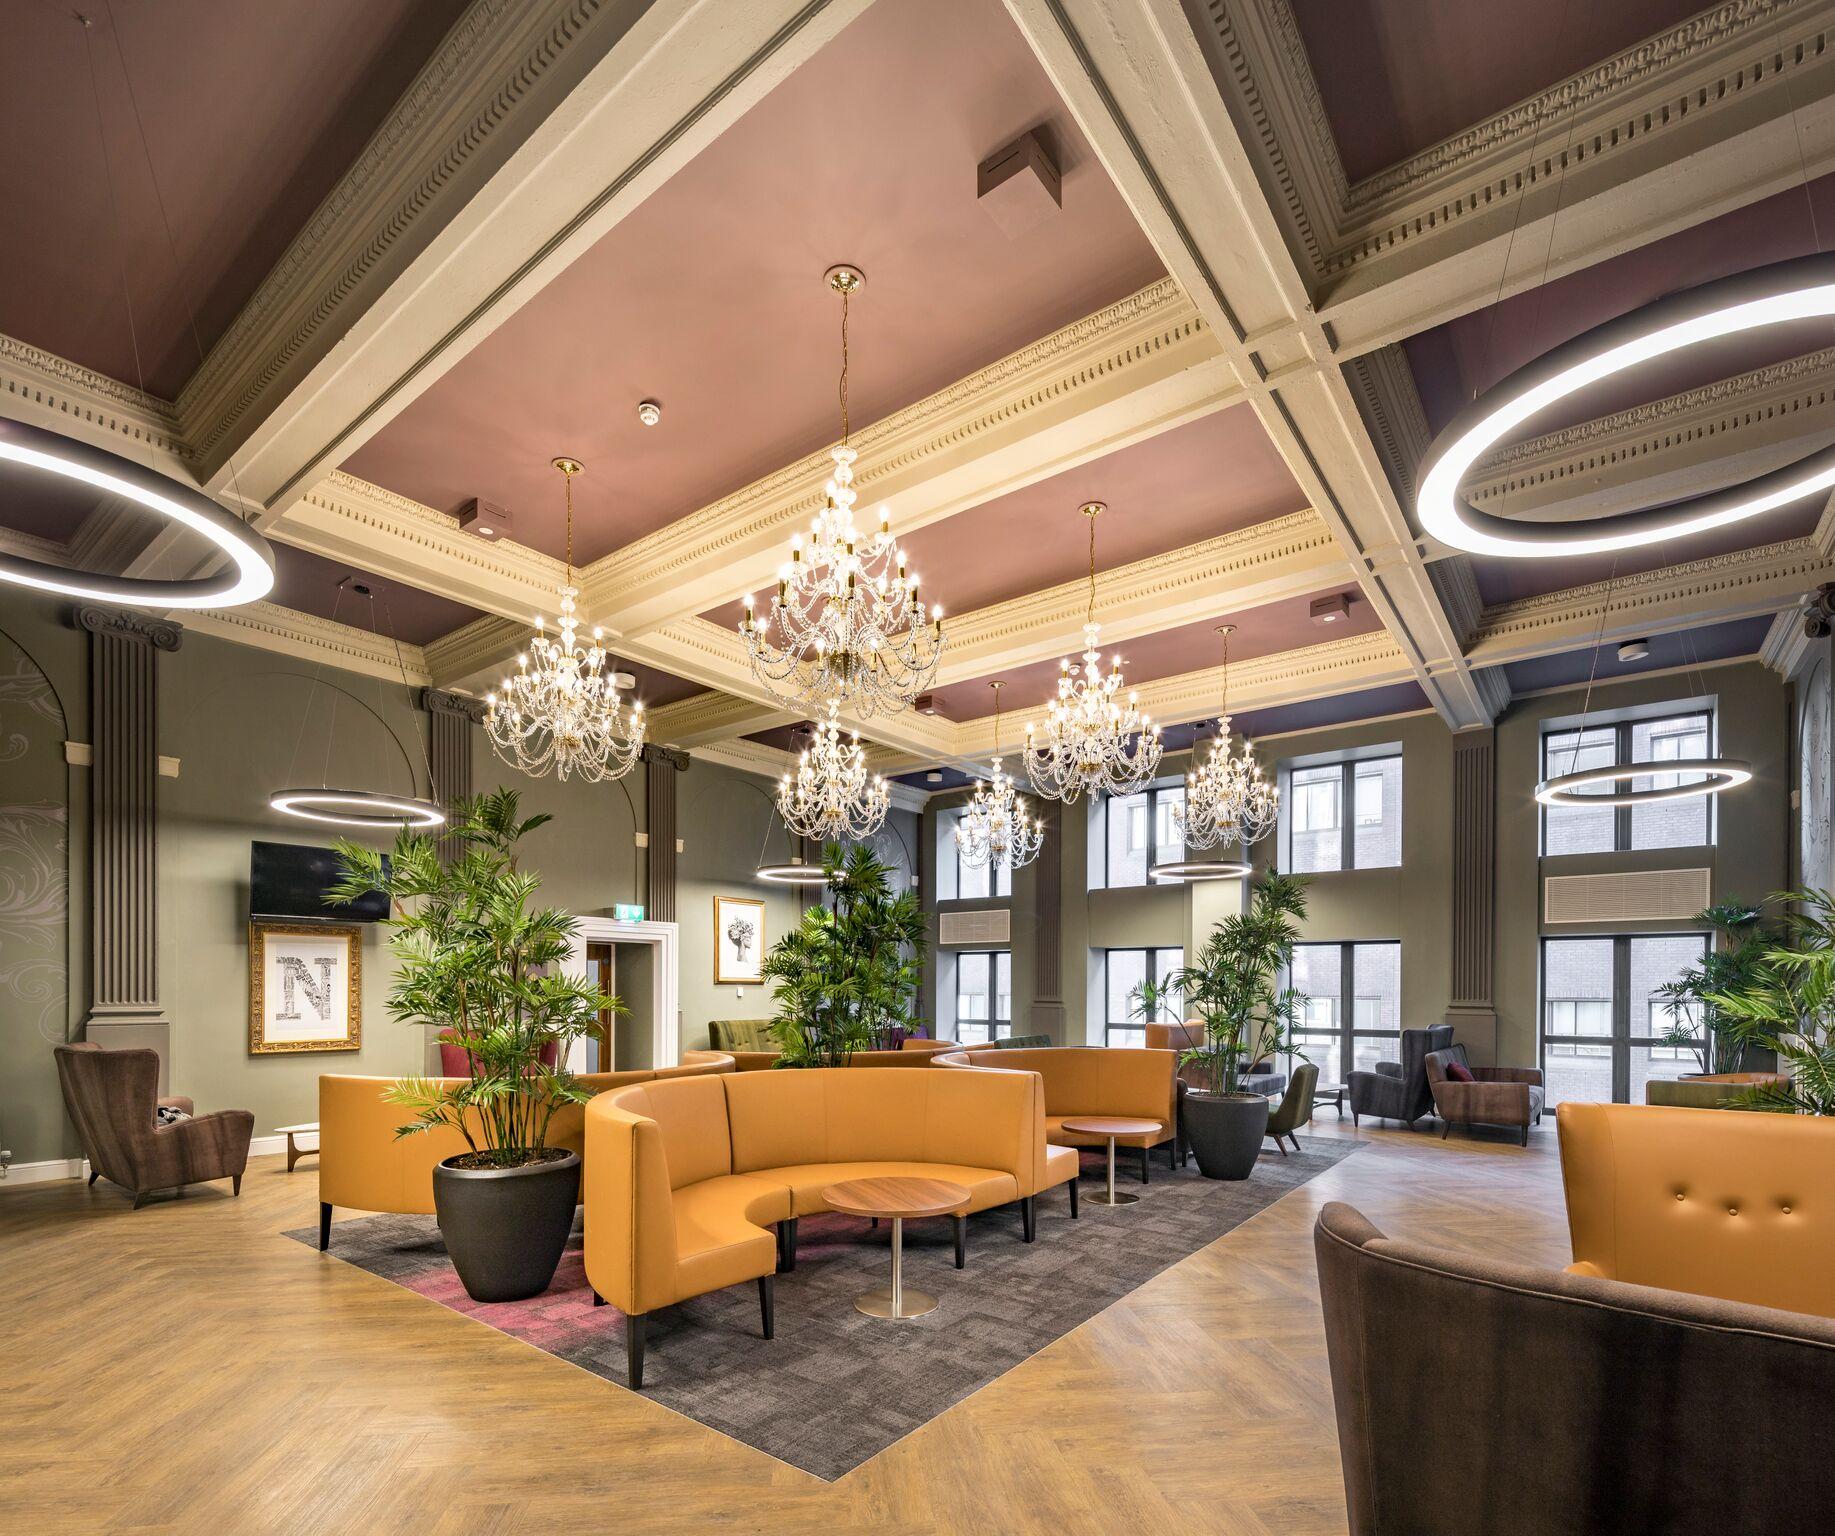 Studio Apartment Prices: Studio Accommodation In Newcastle Upon Tyne